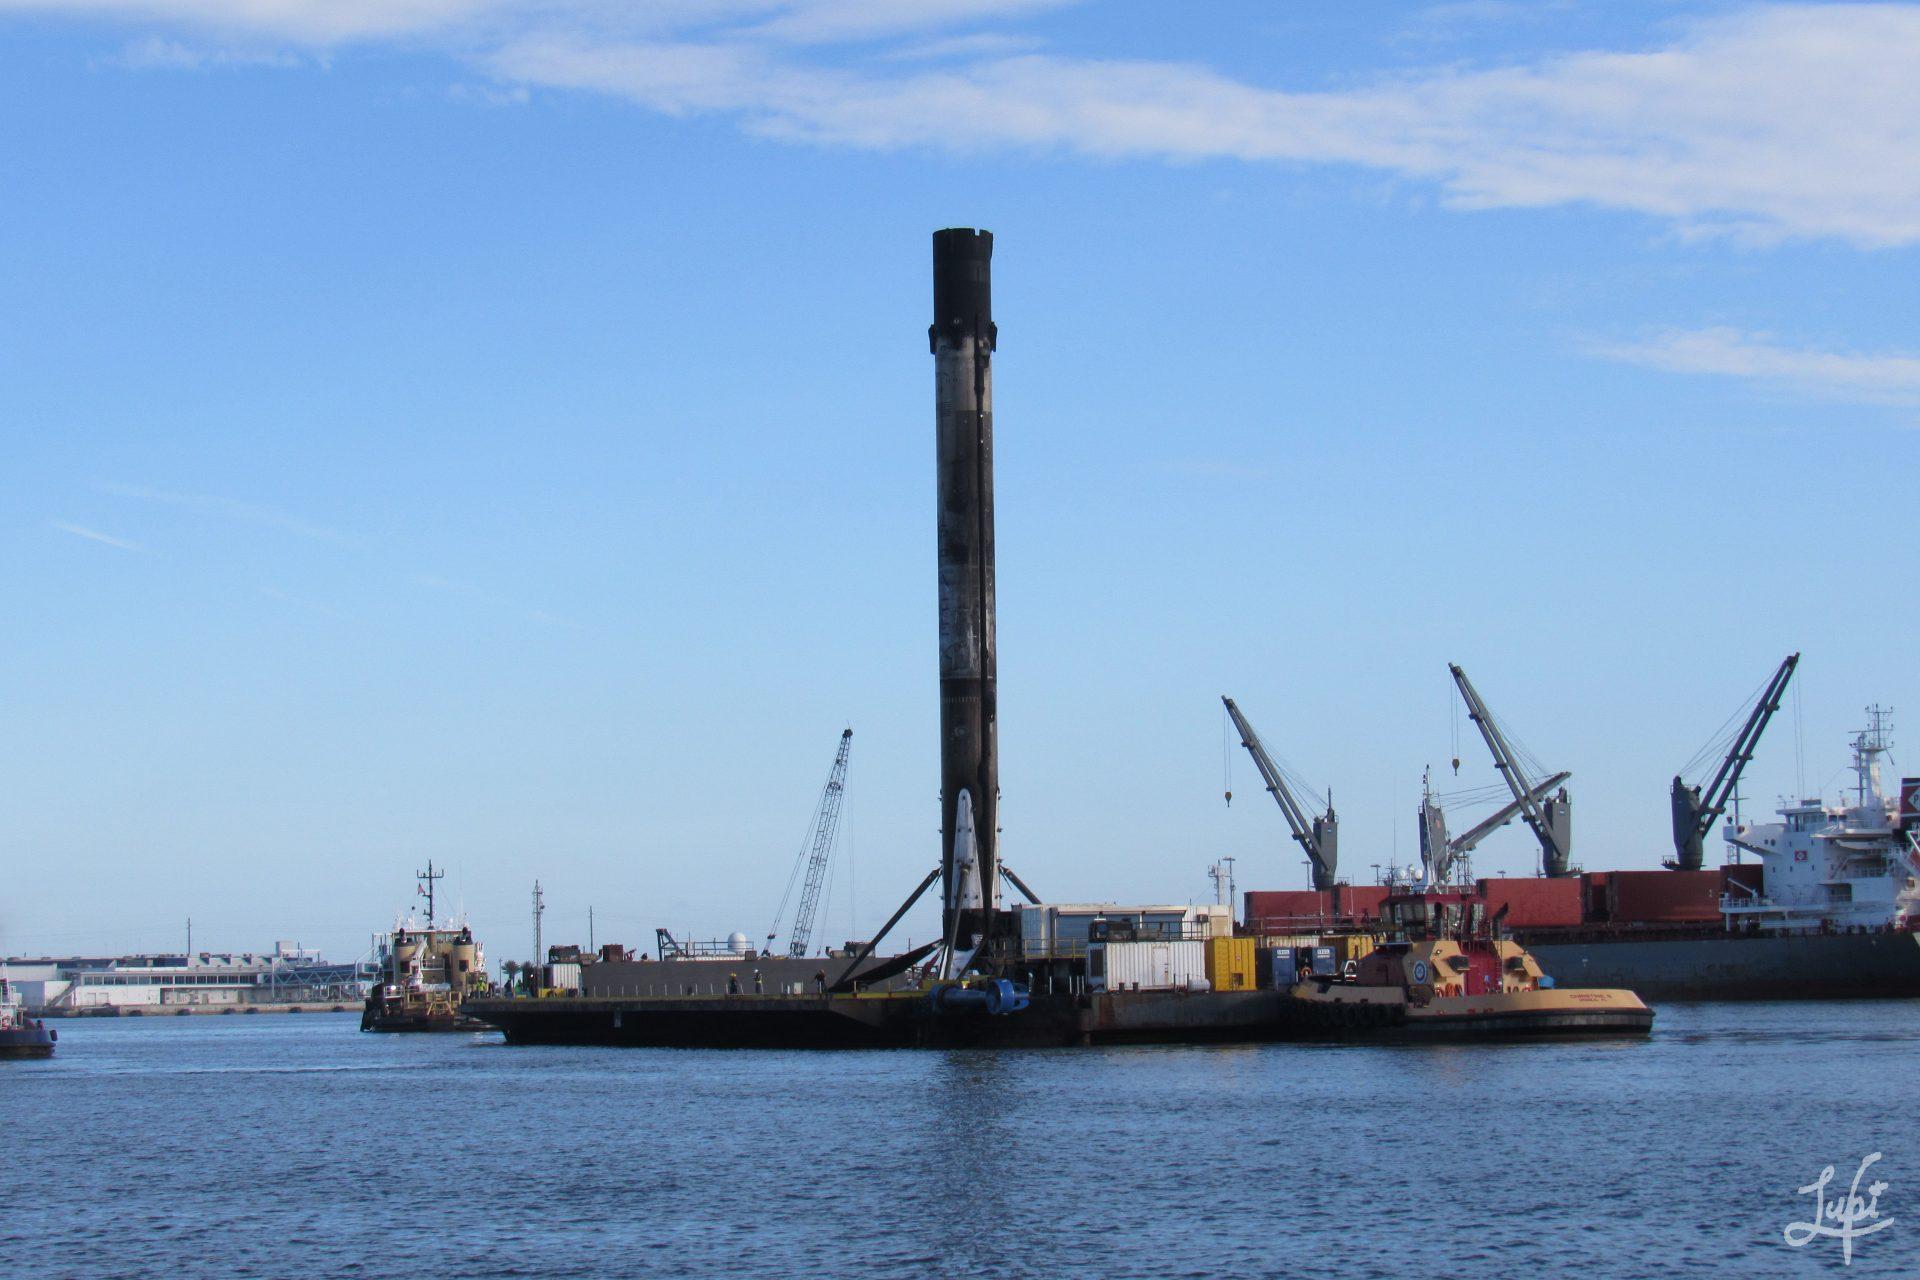 Falcon 9 entering port